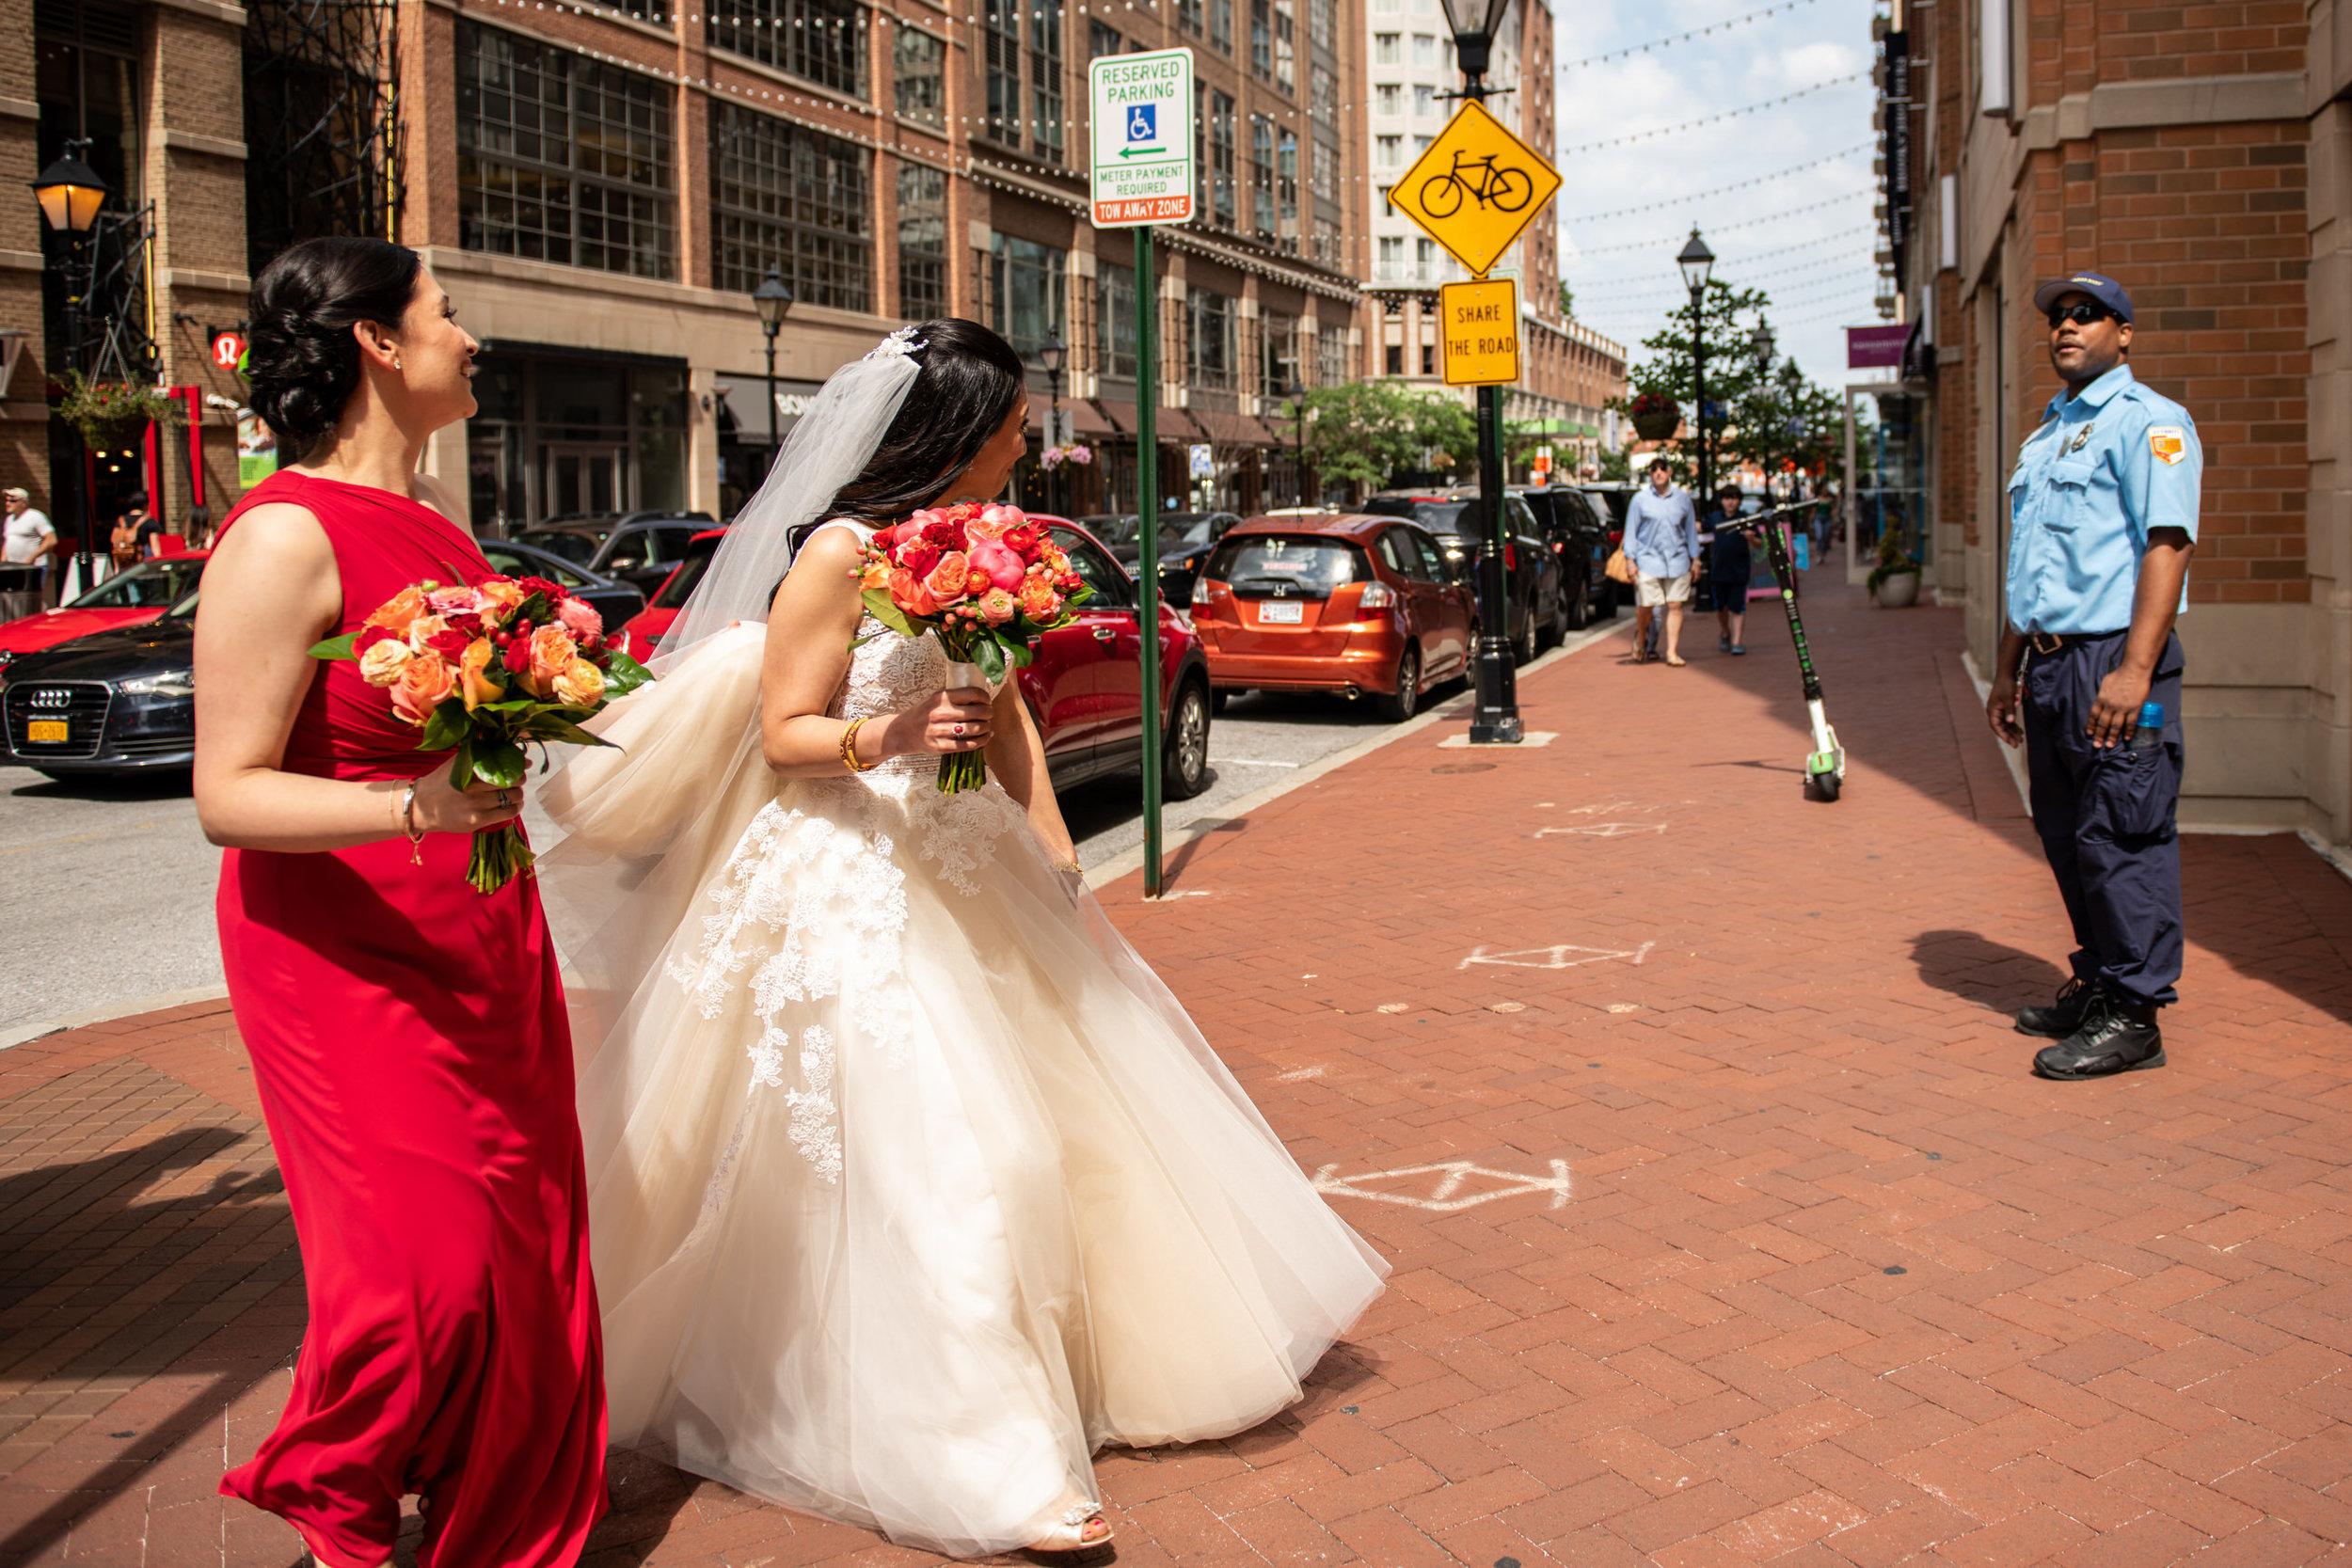 BaltimoreBelvedereWedding-Saniha&Mo-GettingReady-3839.jpg